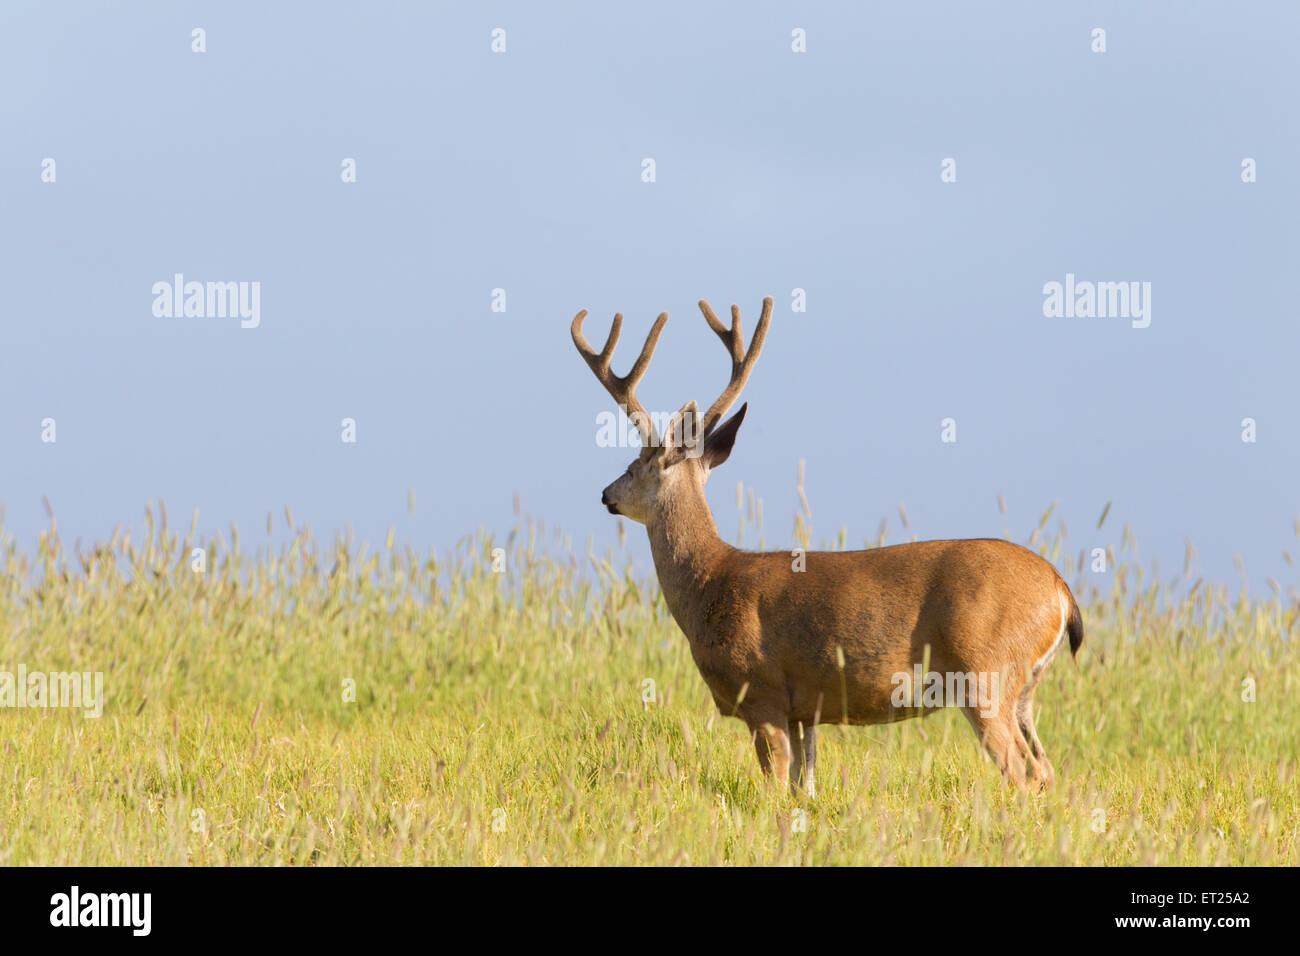 Black-tailed Deer - Stock Image